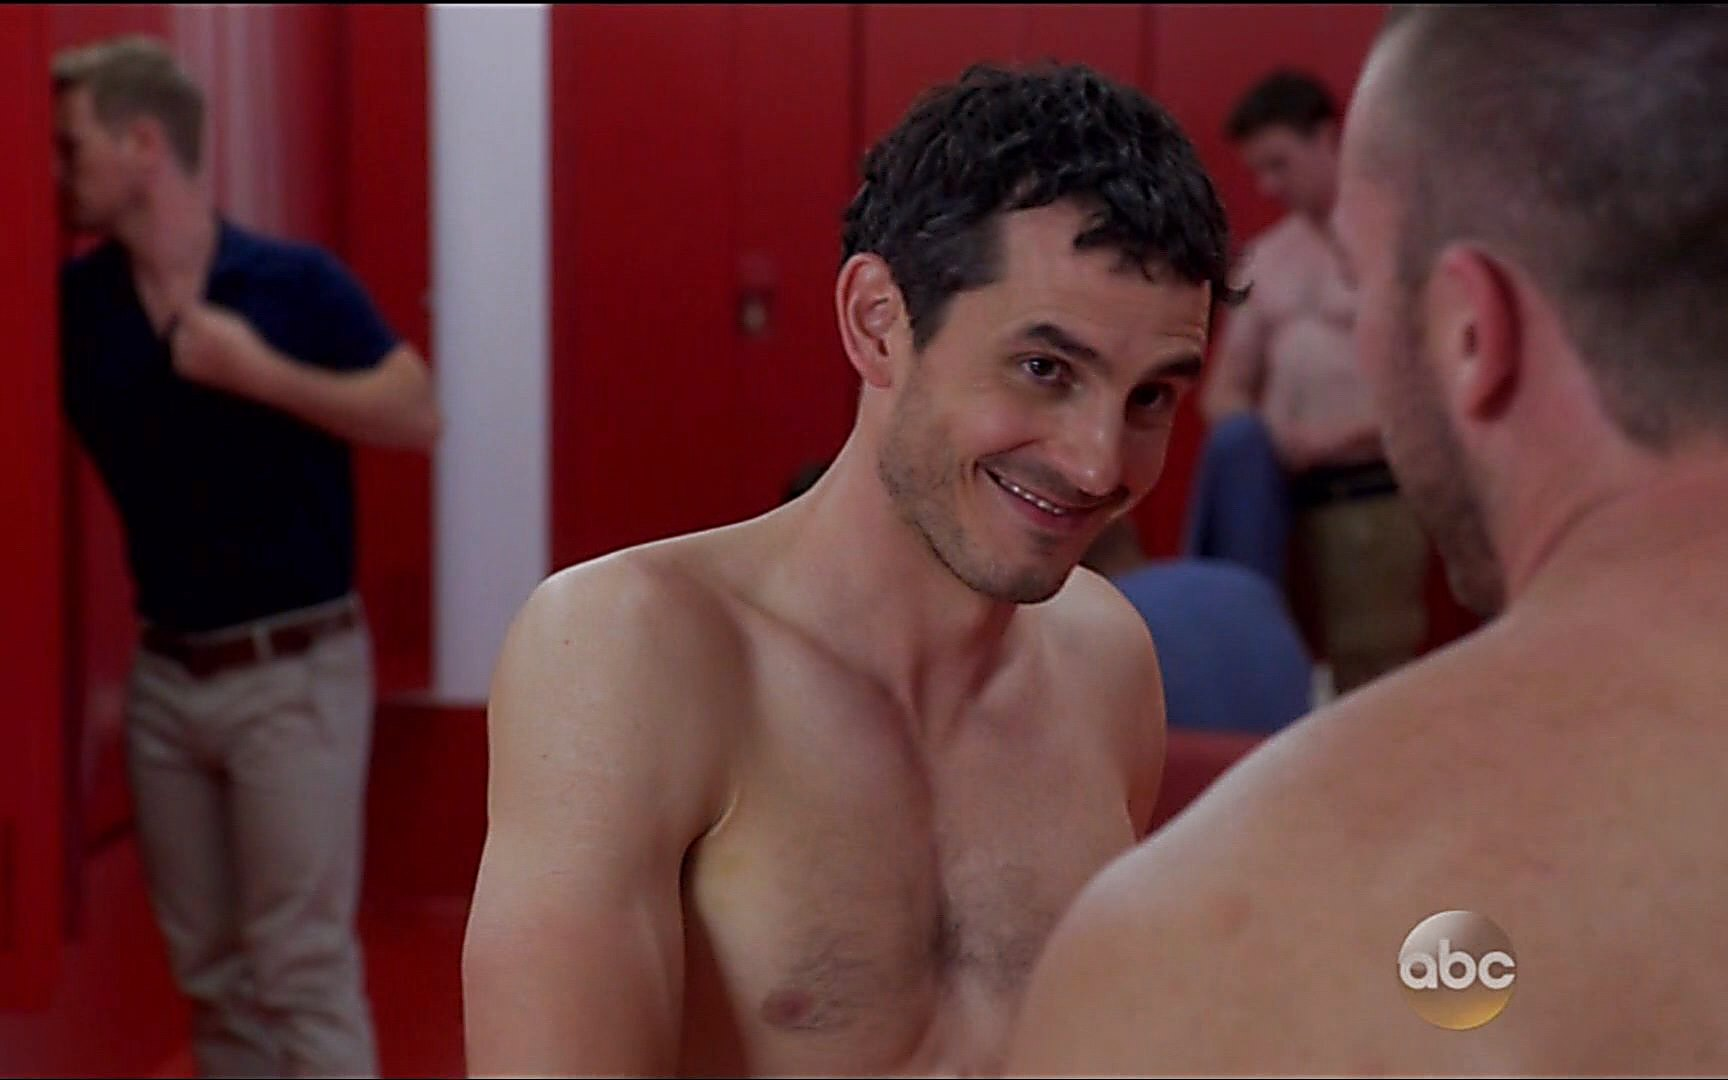 Jake Mclaughlin sexy shirtless scene October 18, 2015, 2am